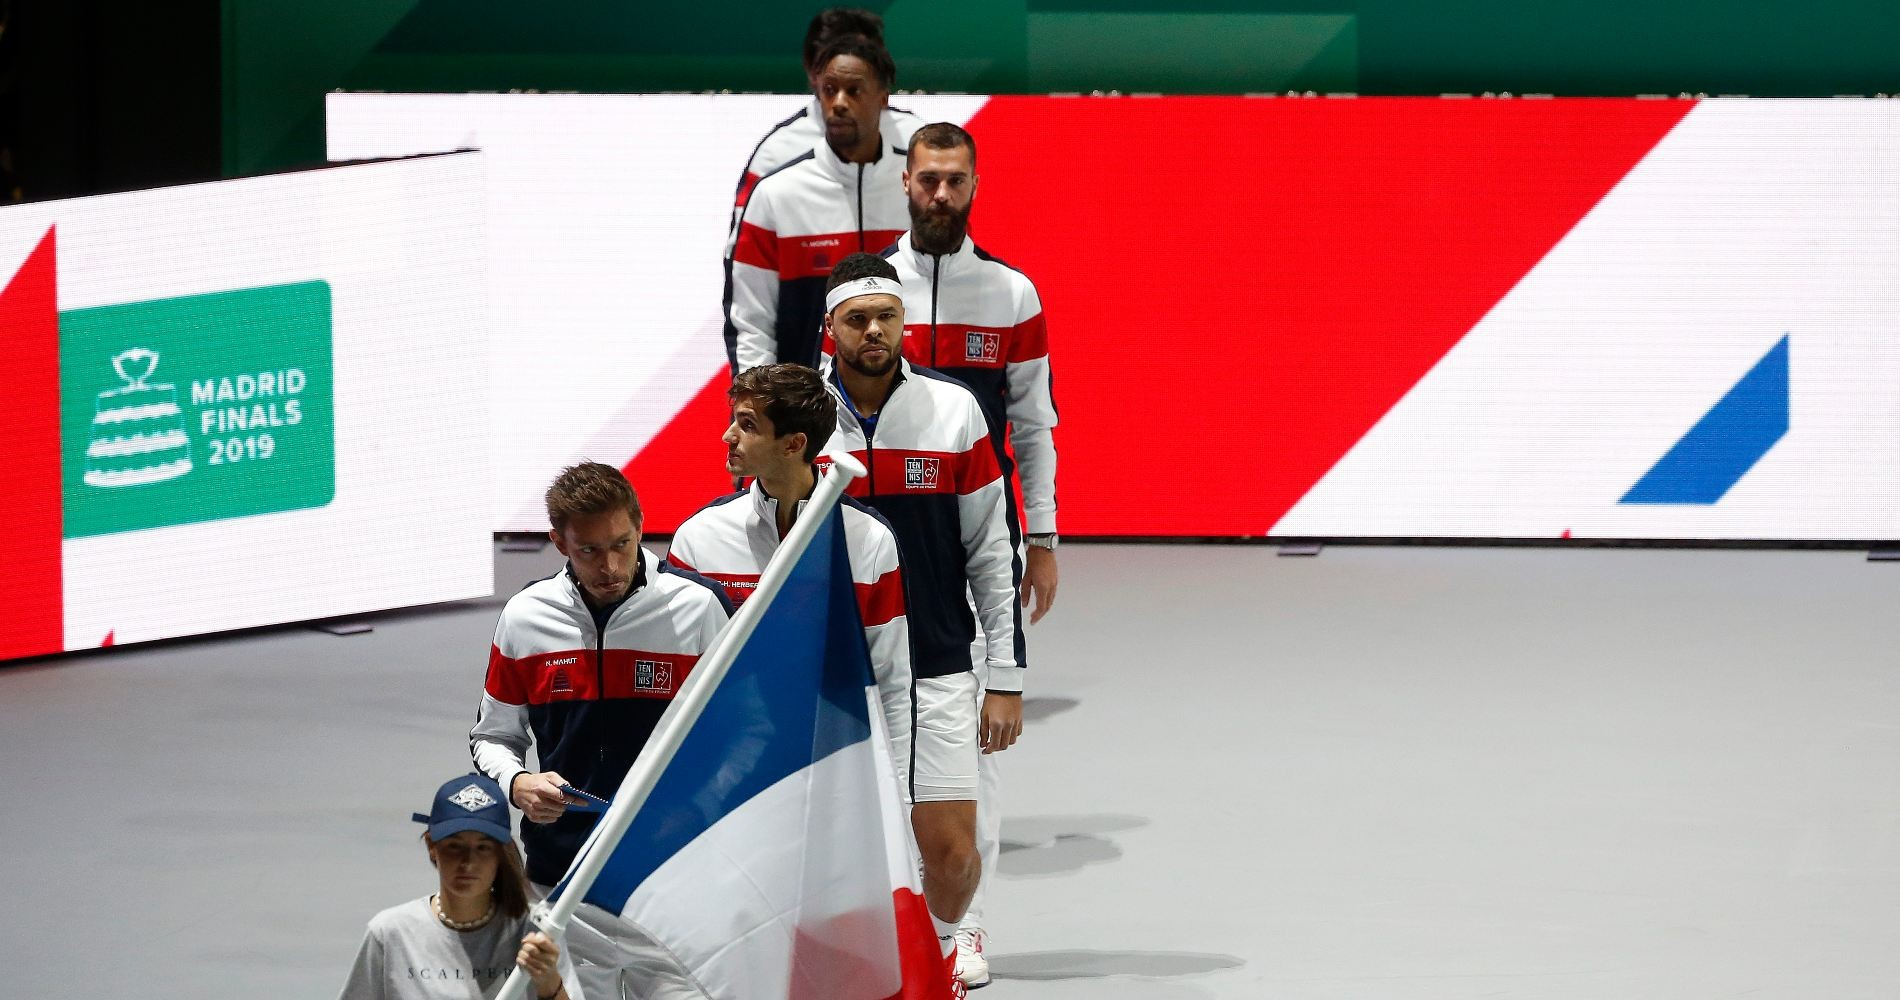 Coupe Davis, France, 2019